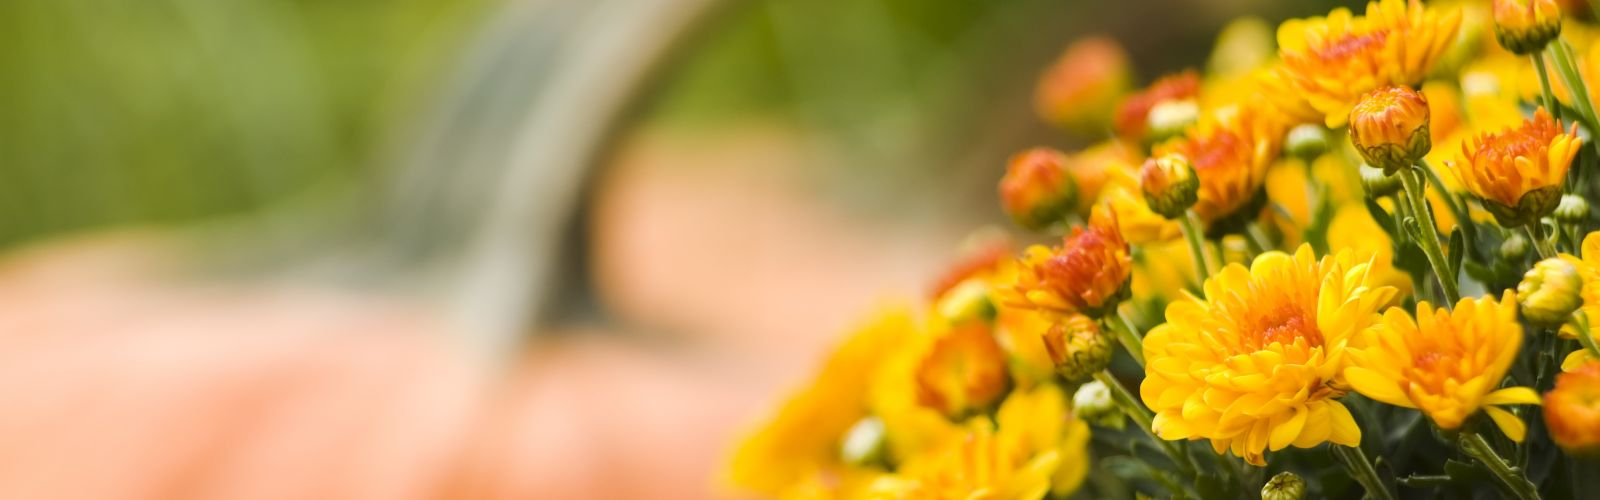 yellow blooming mum with orange pumpkin in background